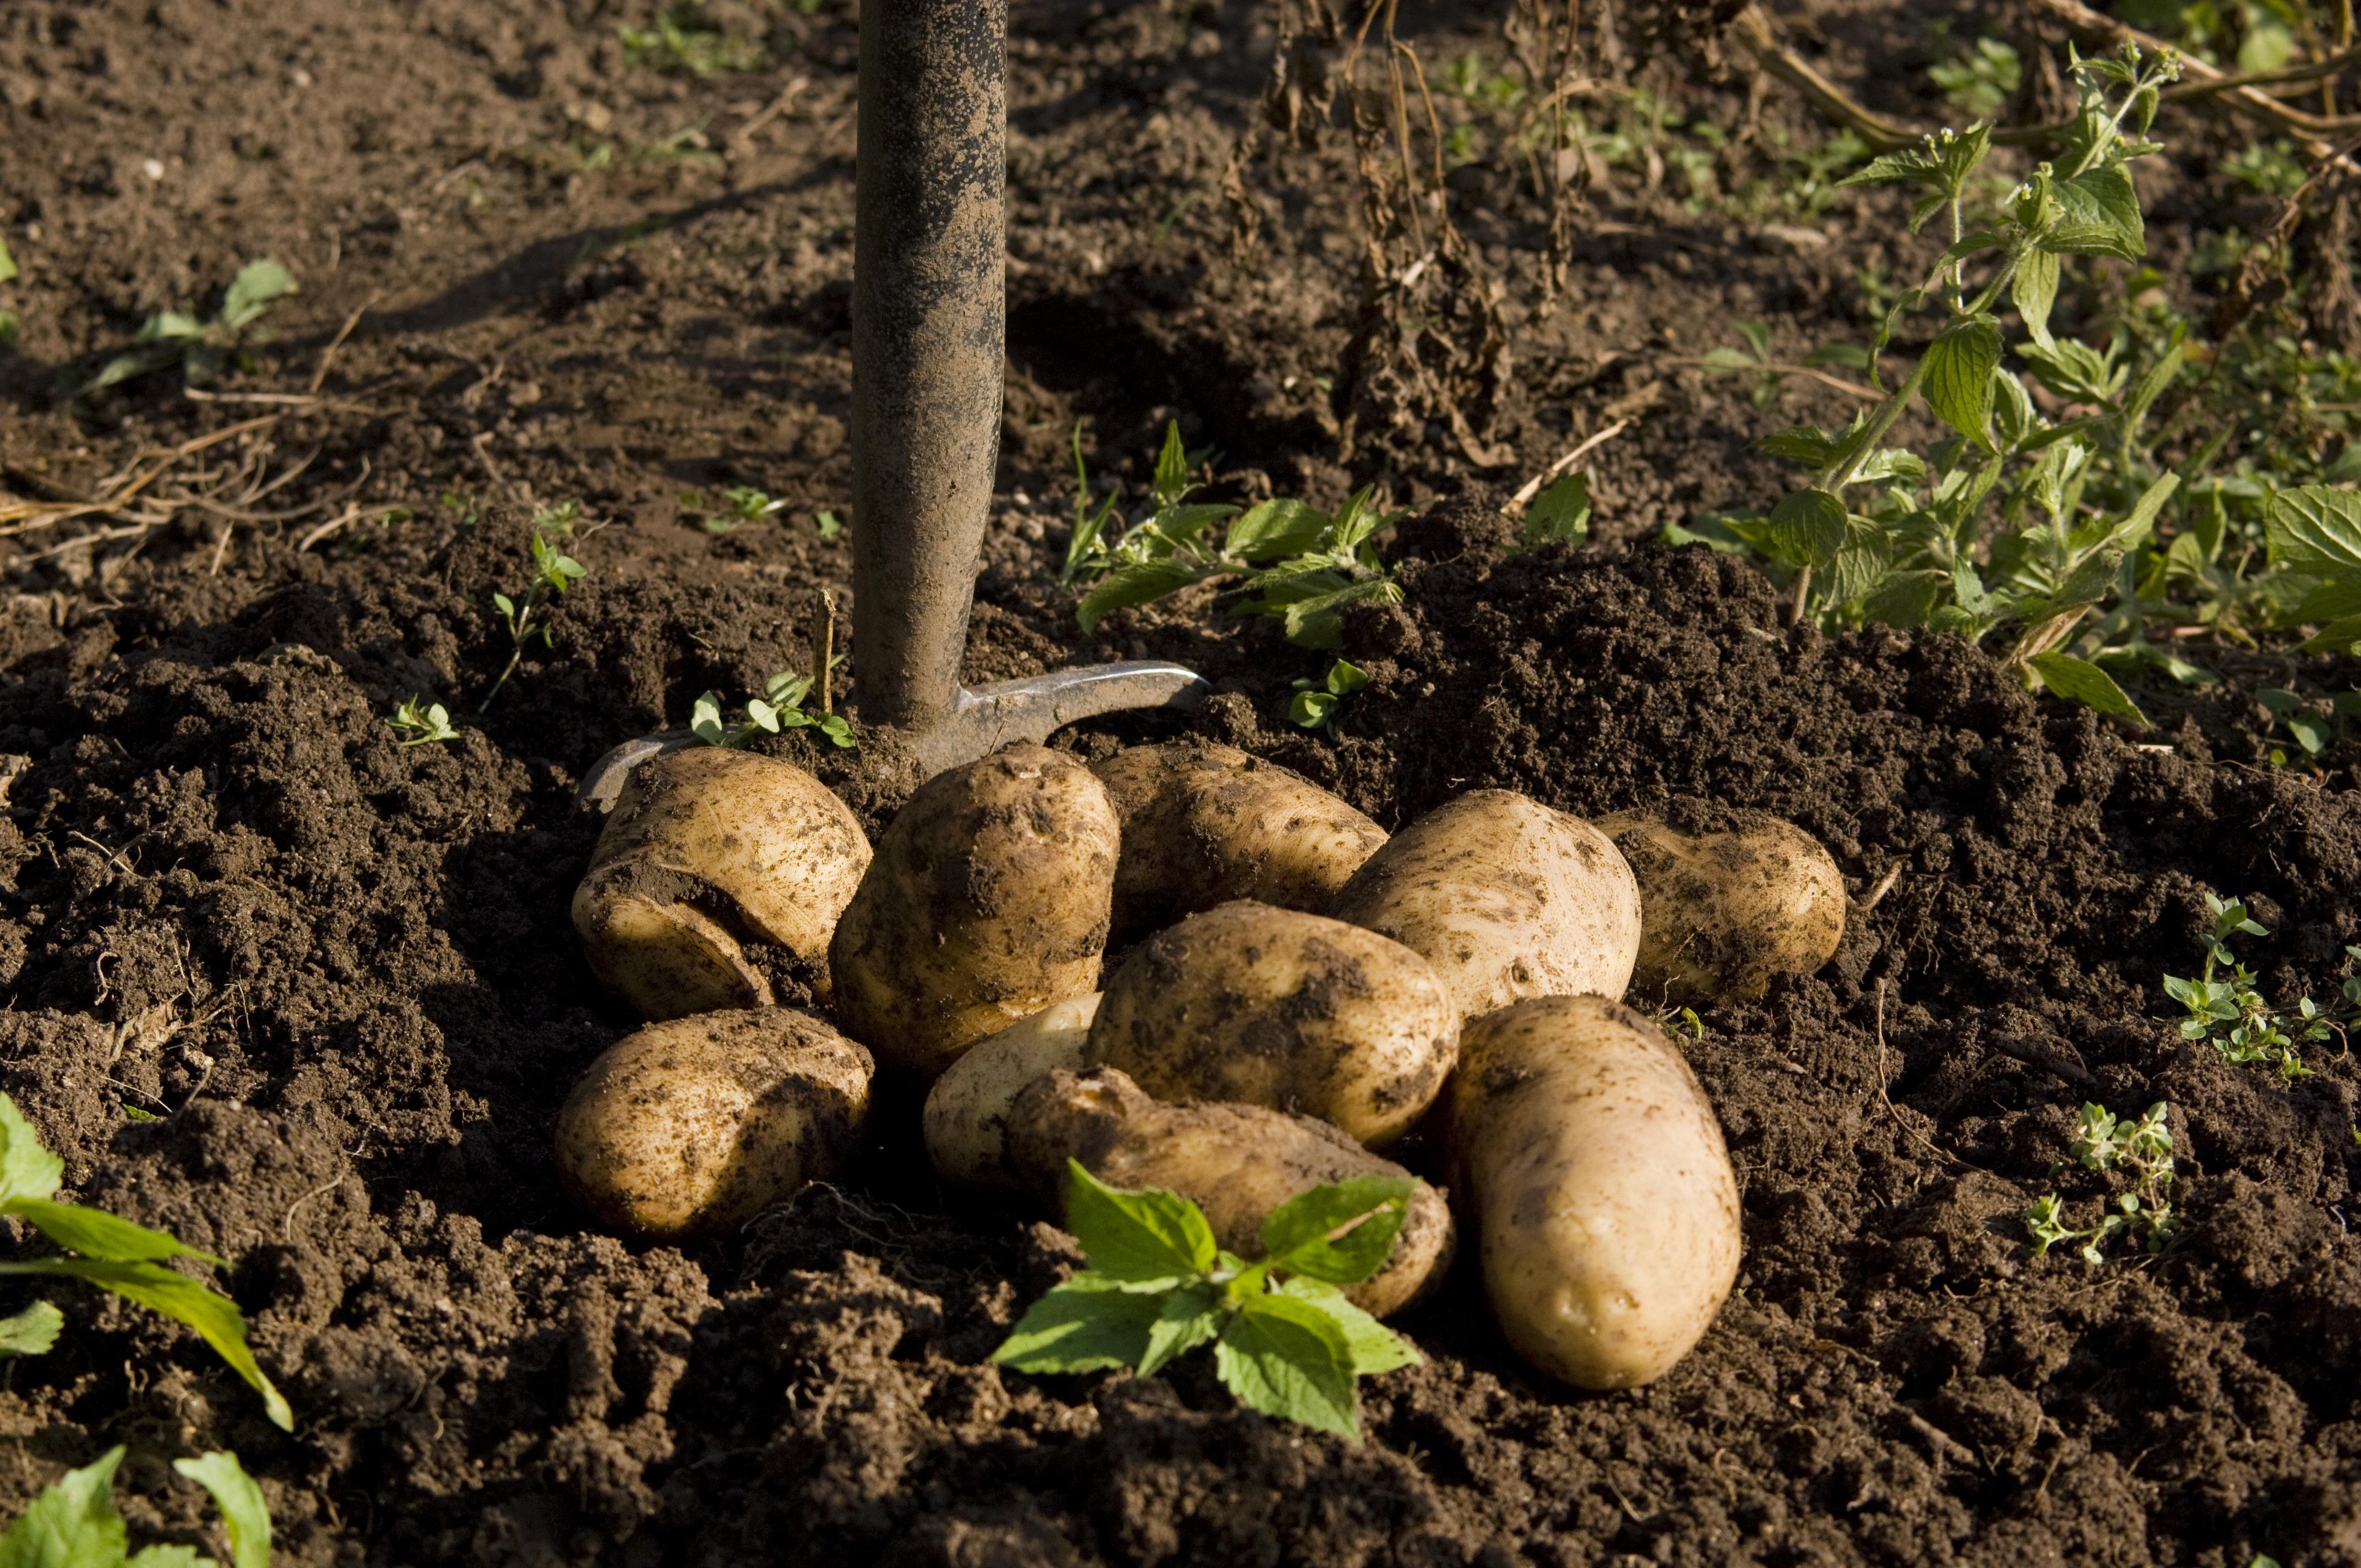 Free Images : tree, nature, forest, leaf, food, harvest, produce ...